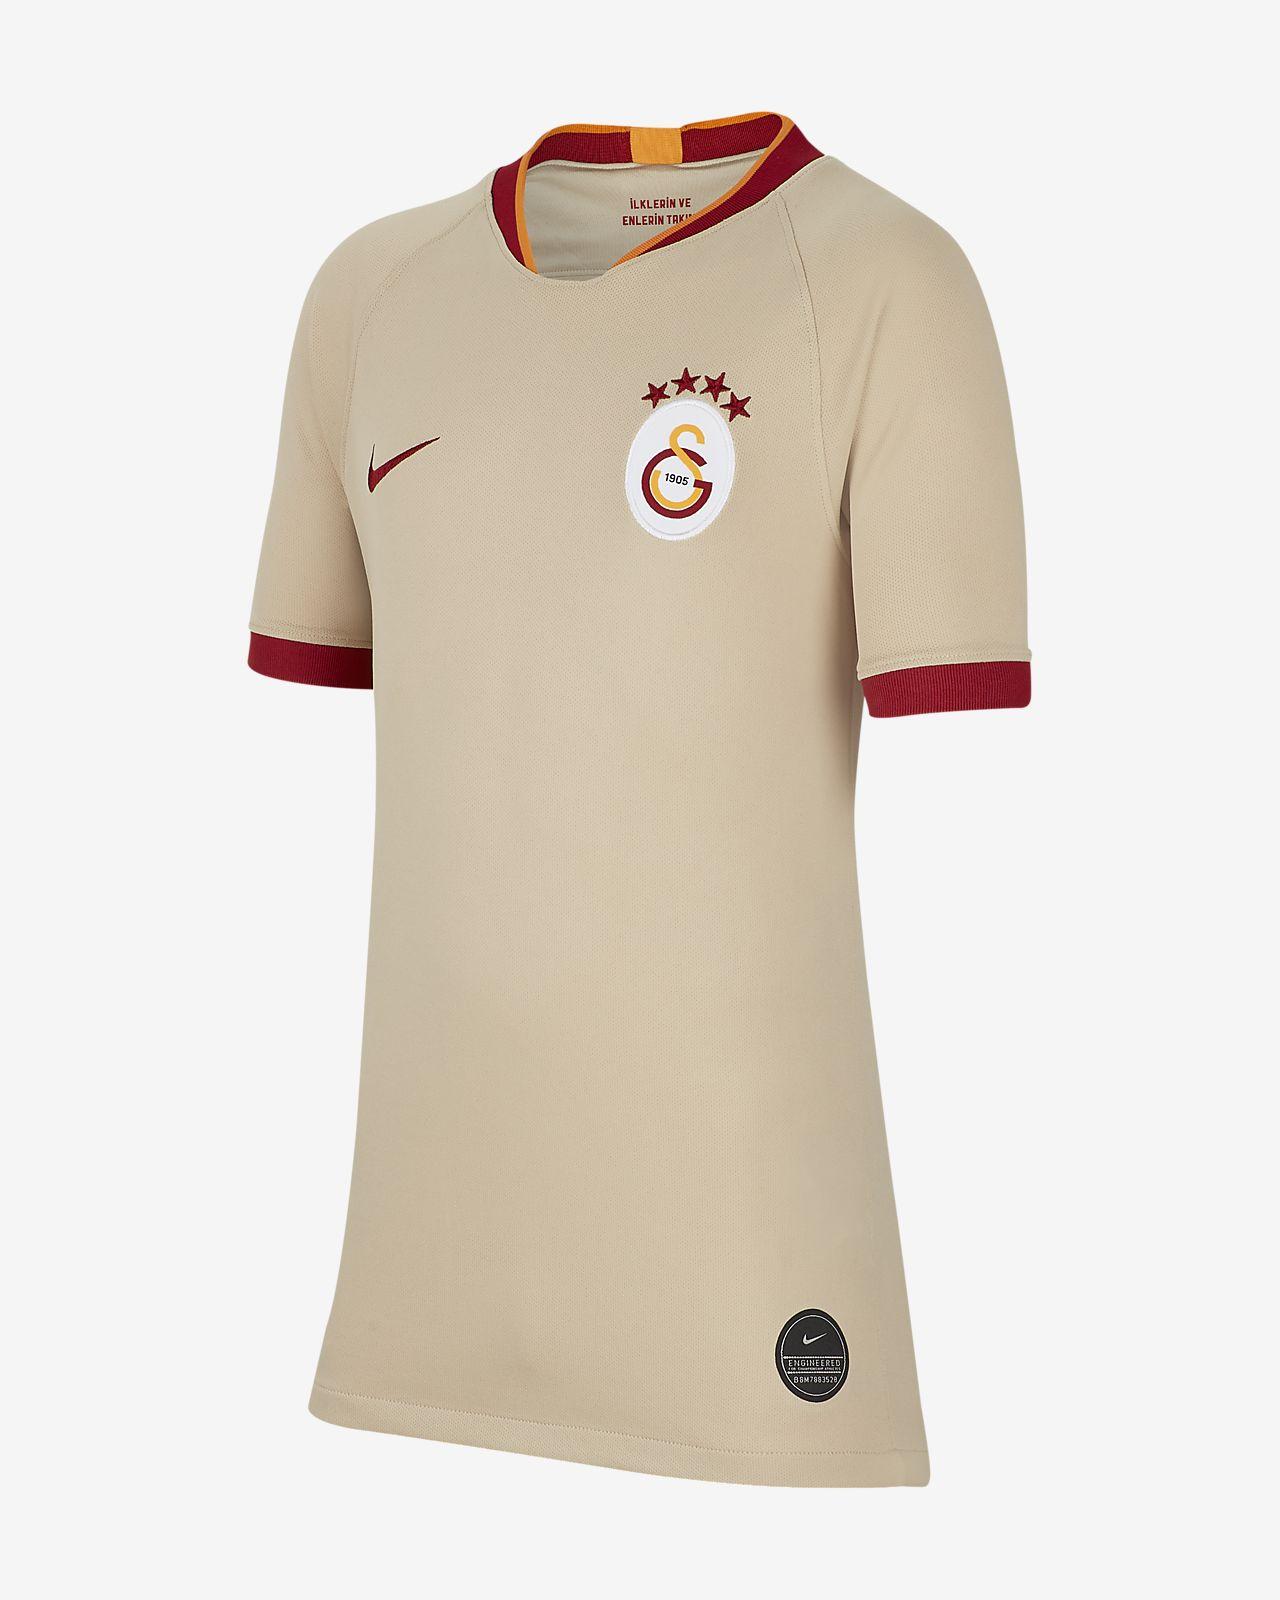 Fotbollströja 2020 Galatasaray S.K. Stadium Away för ungdom